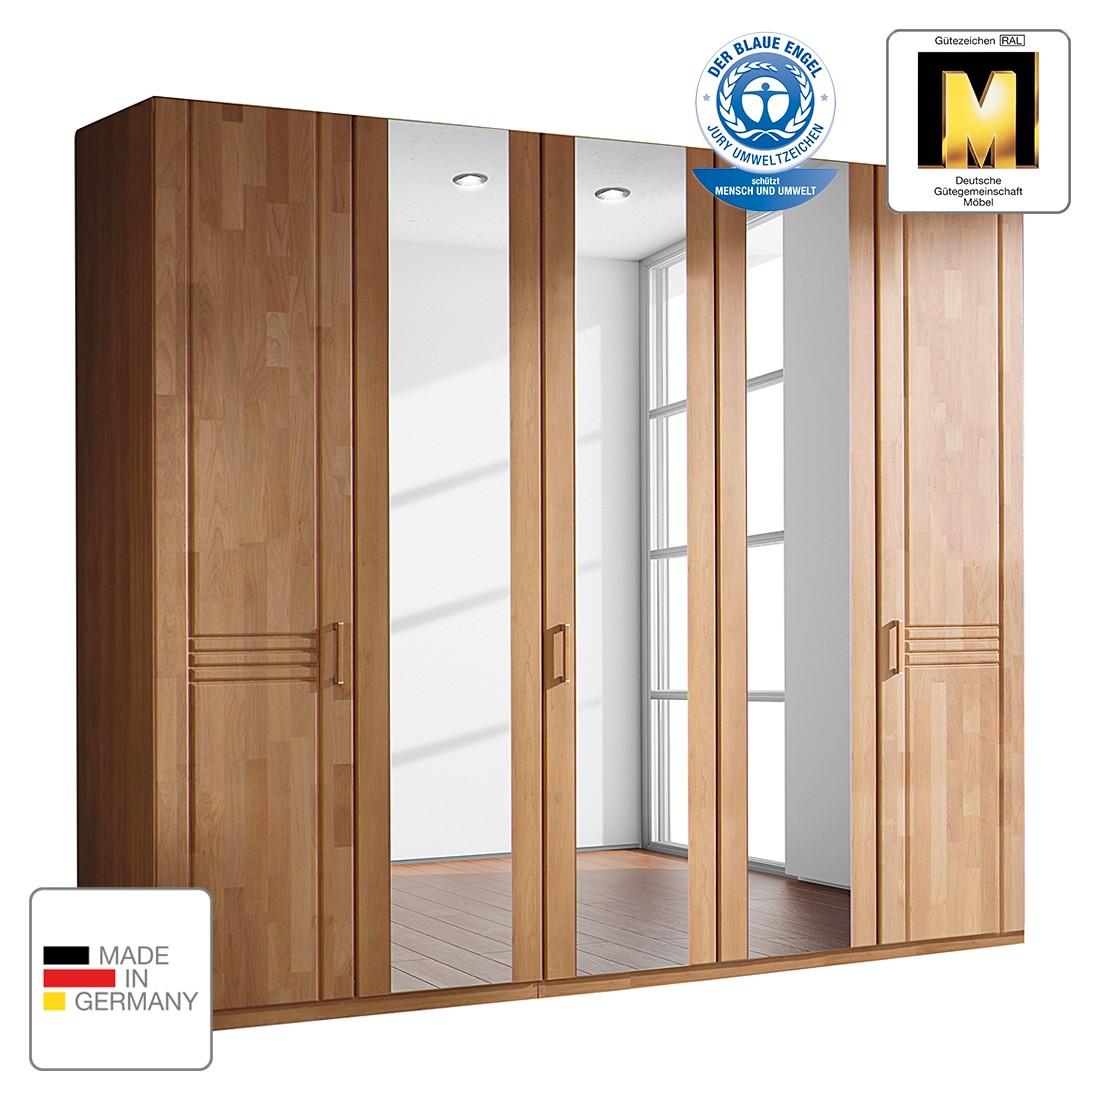 goedkoop Draaideurkast Savina Els 142cm 3 deurs 1 spiegeldeur Zonder Passe partout lijst Rauch Steffen